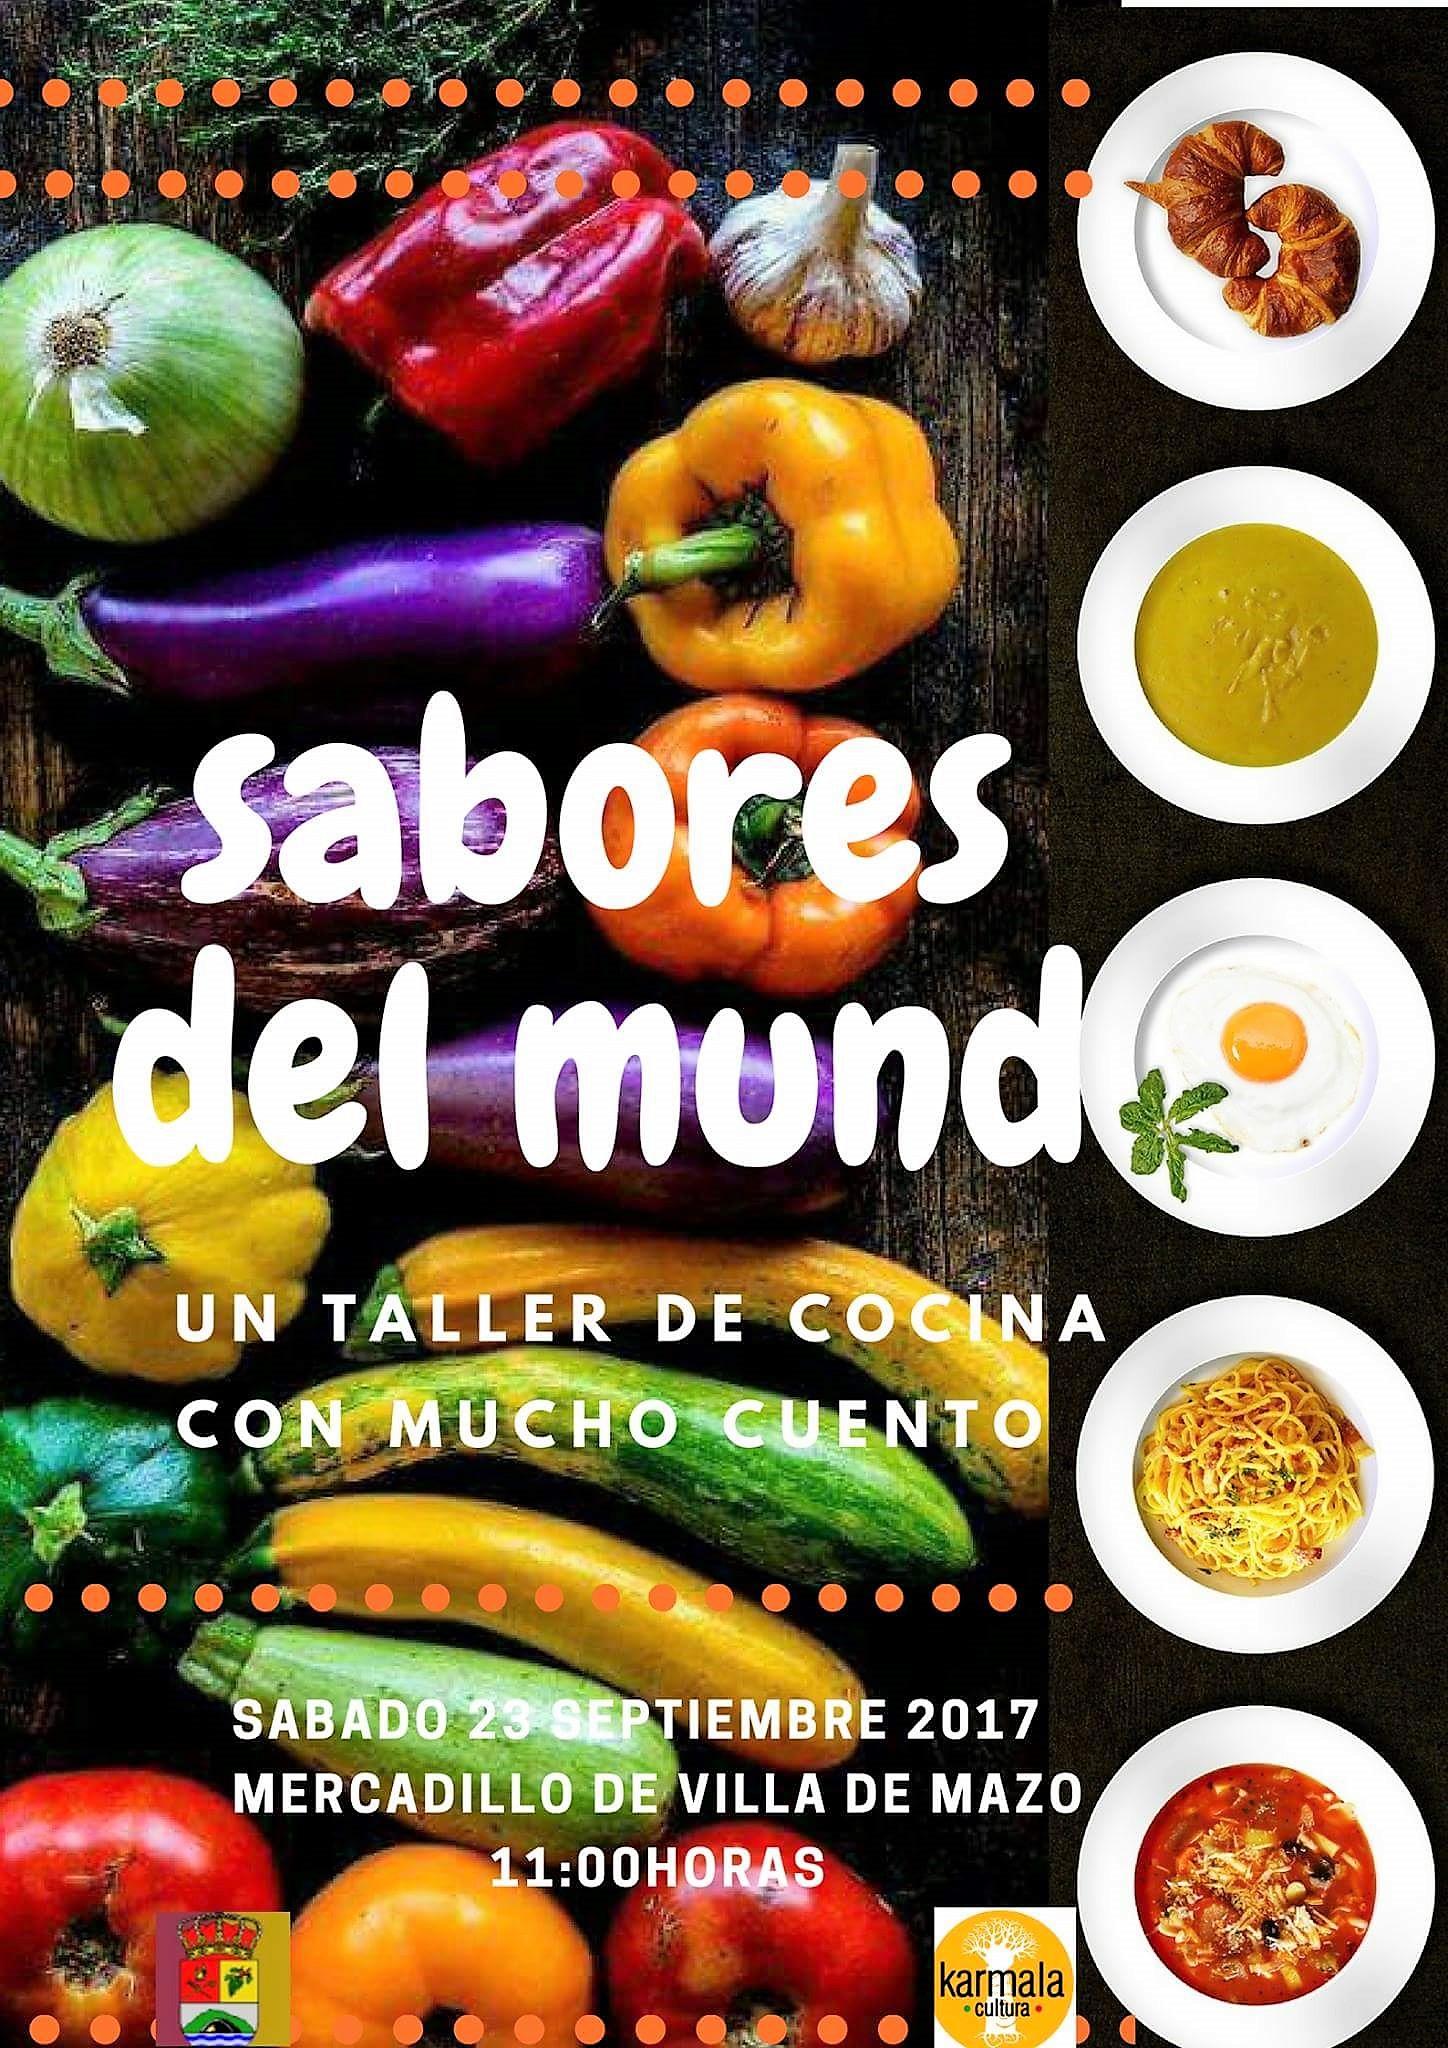 Taller De Cocina Sabores | Mazo Organiza La Actividad Sabores Del Mundo Un Taller De Cocina